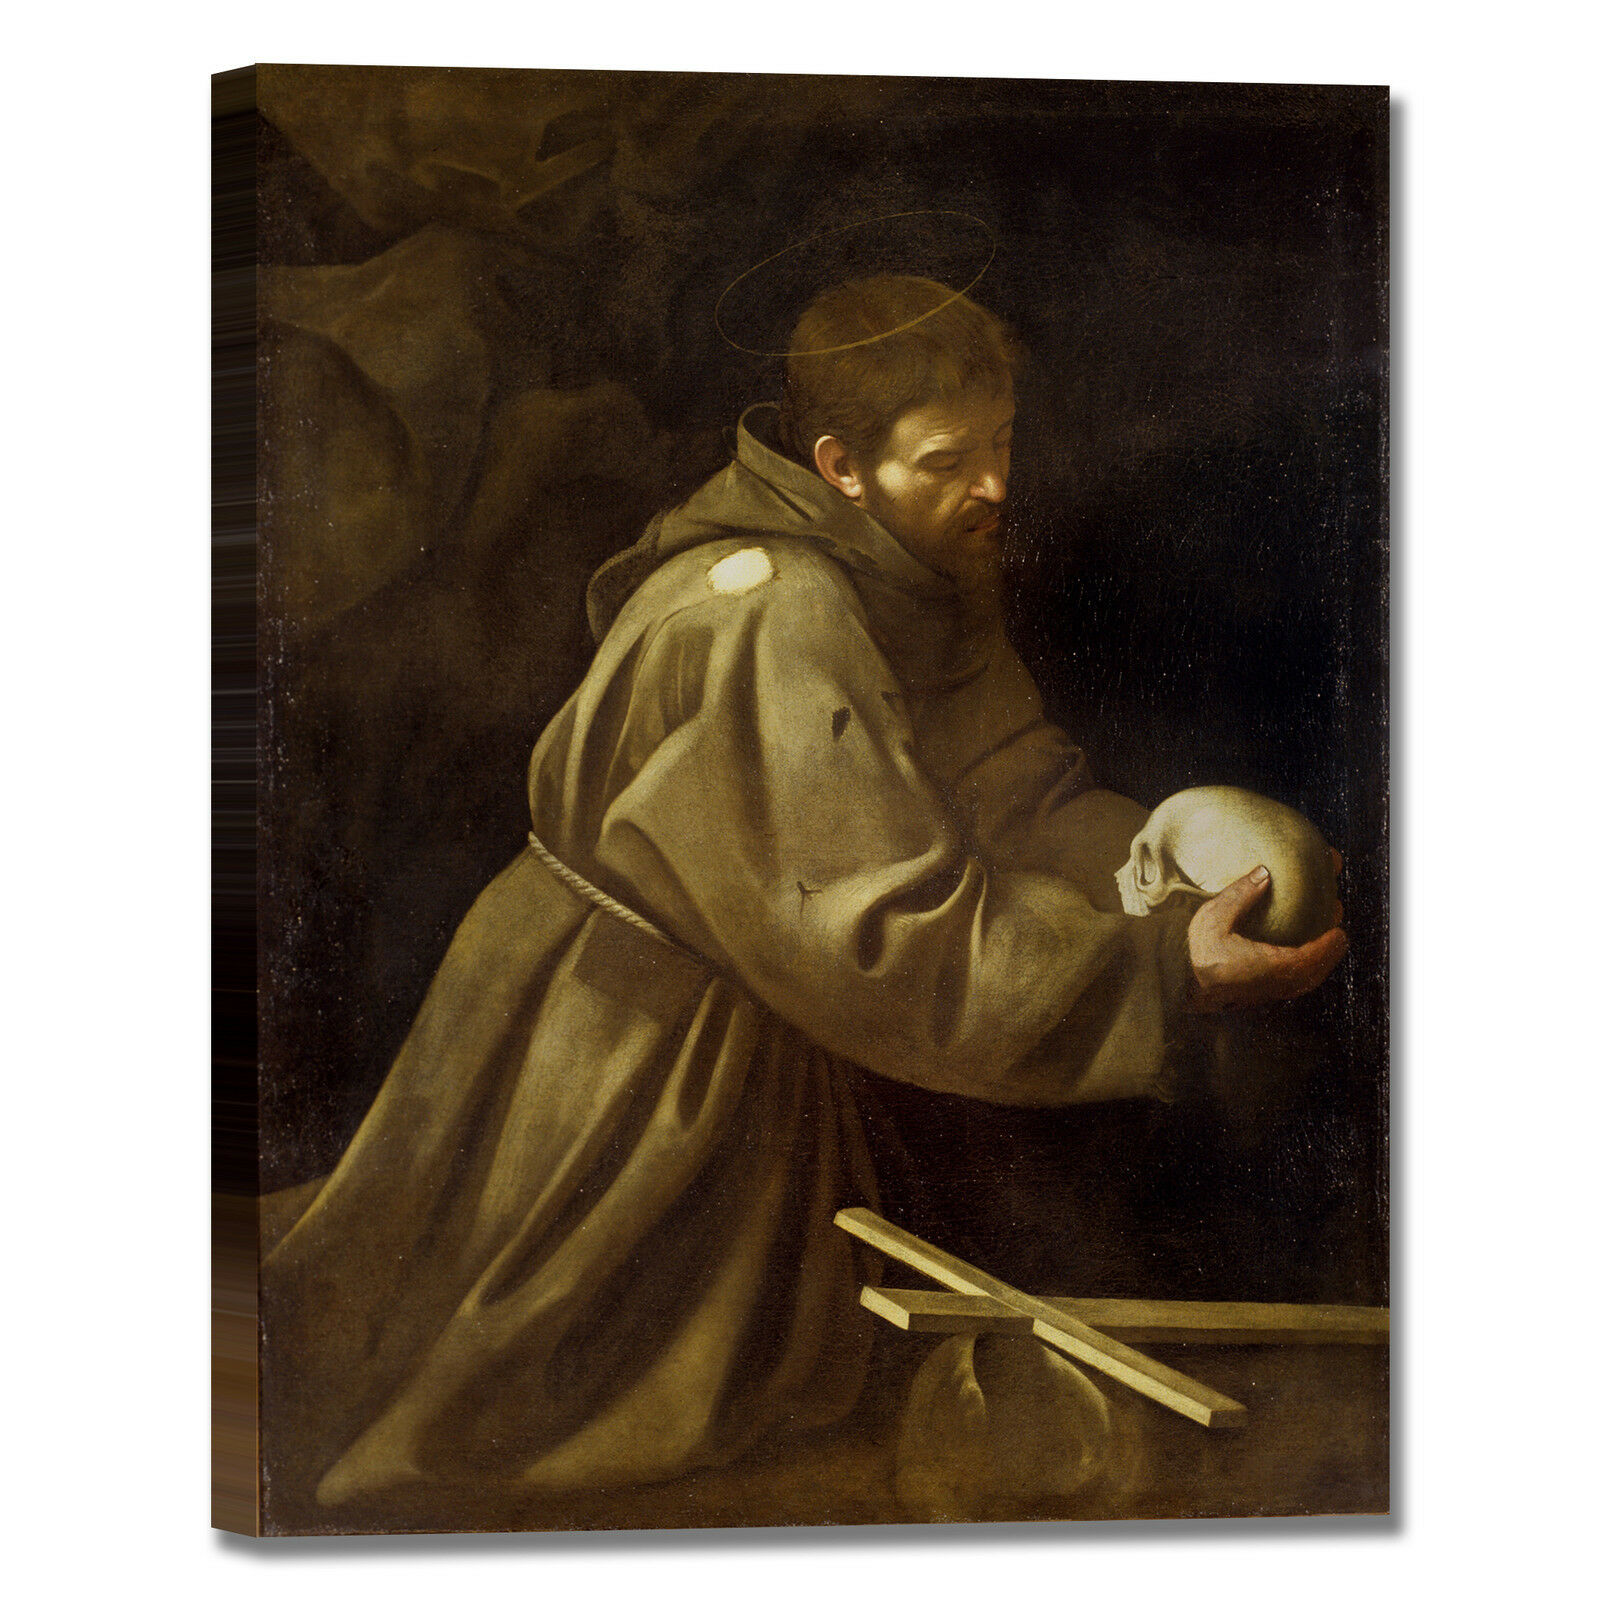 Caravaggio san Francesco meditazione quadro arRouge stampa tela dipinto arRouge quadro o casa dfde08